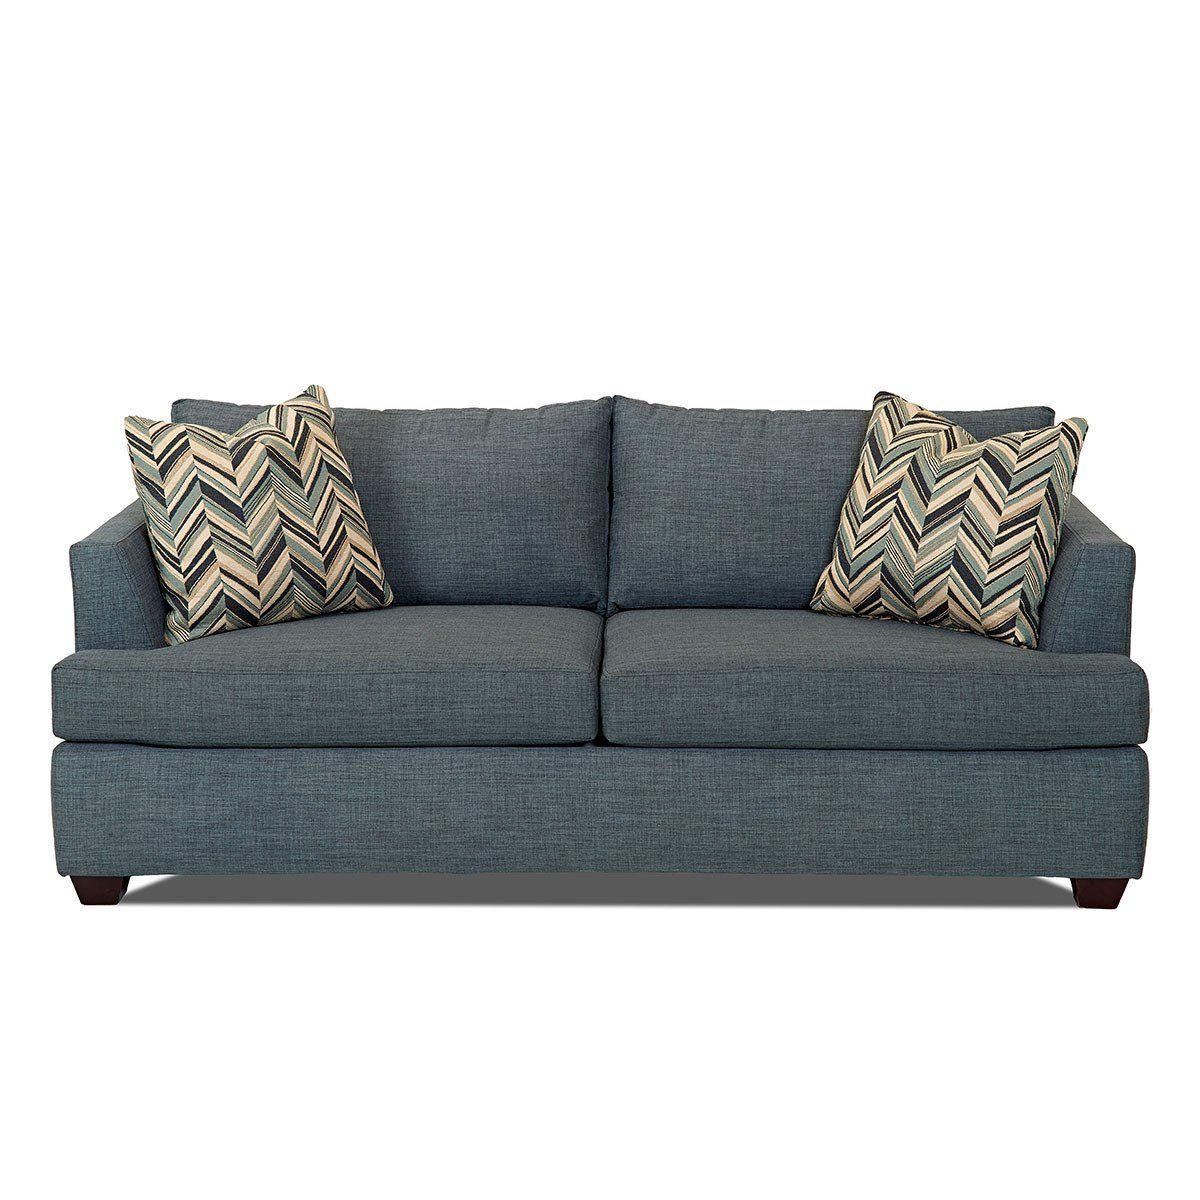 Doug Sofa Sofa, Furniture, Suburban furniture